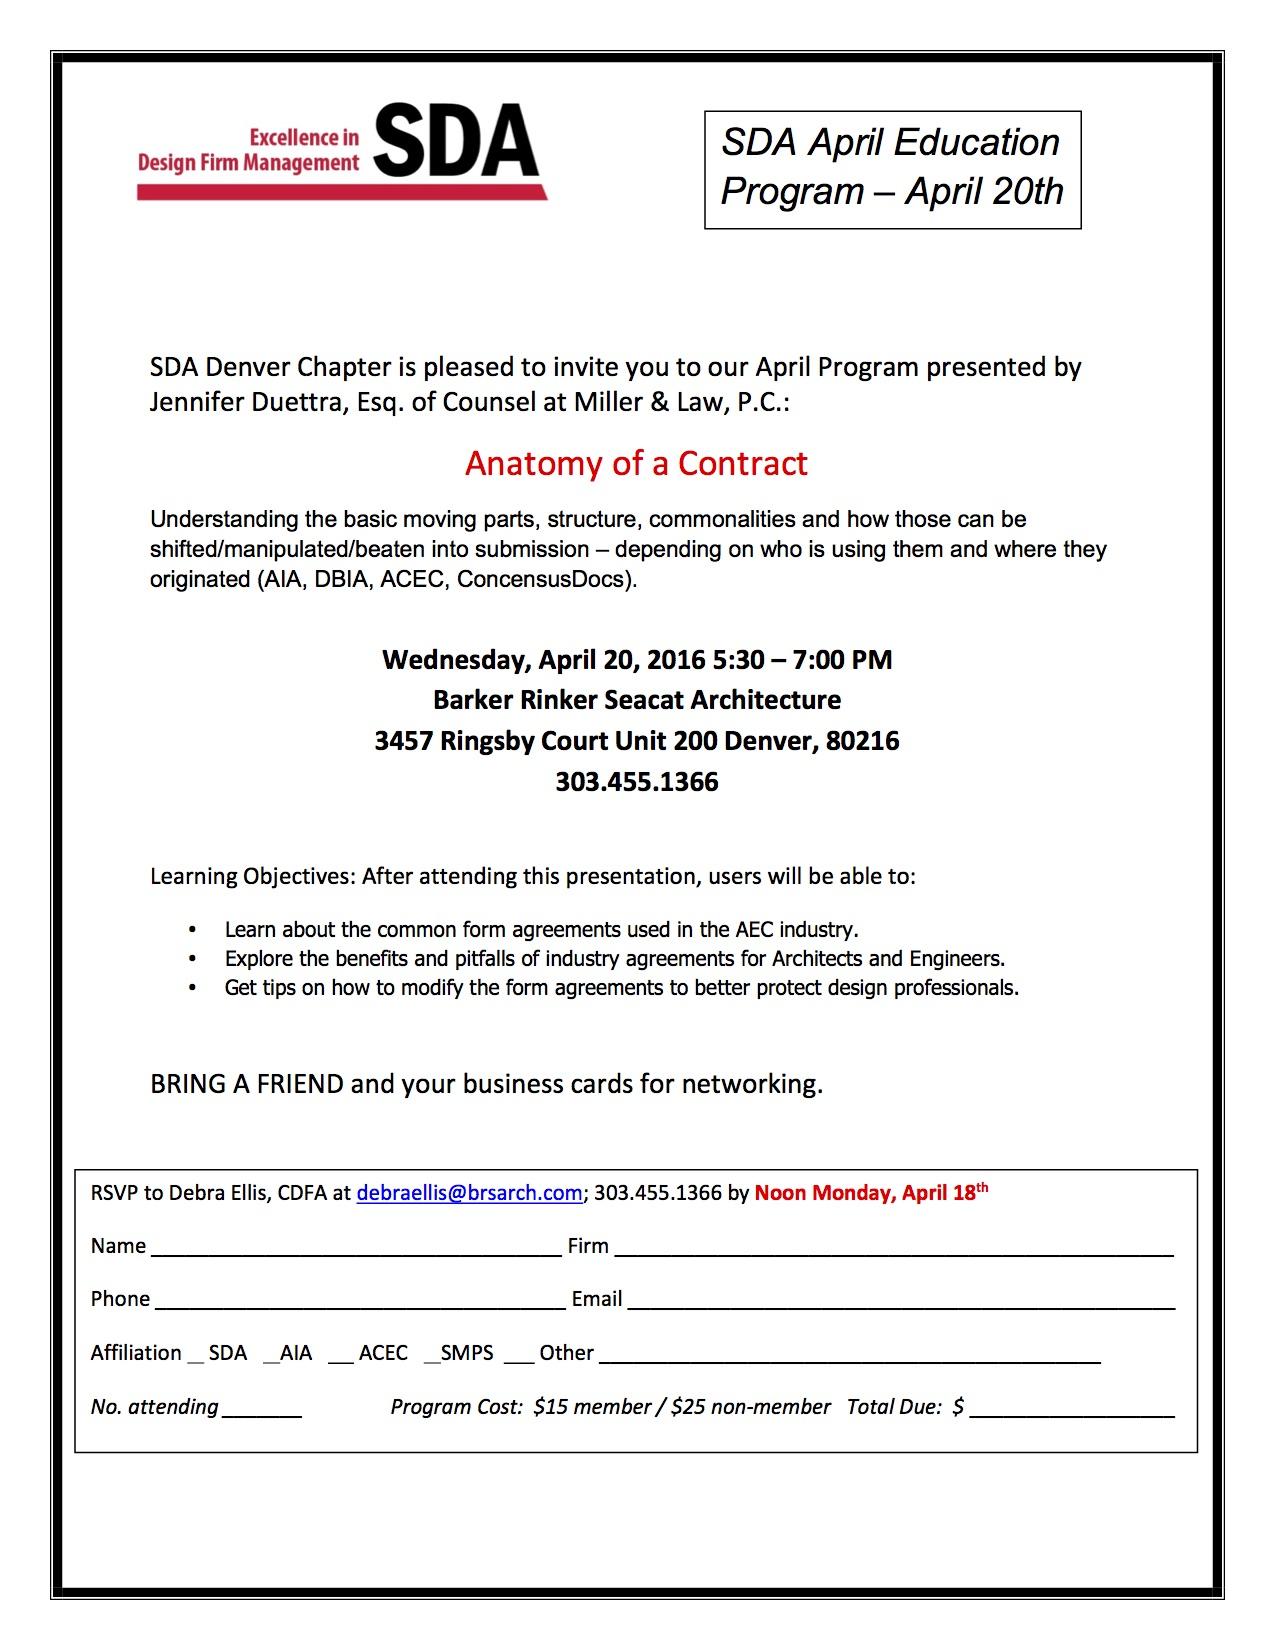 Women In Design – SDA Edcuation Event – Anatomy of a Contract